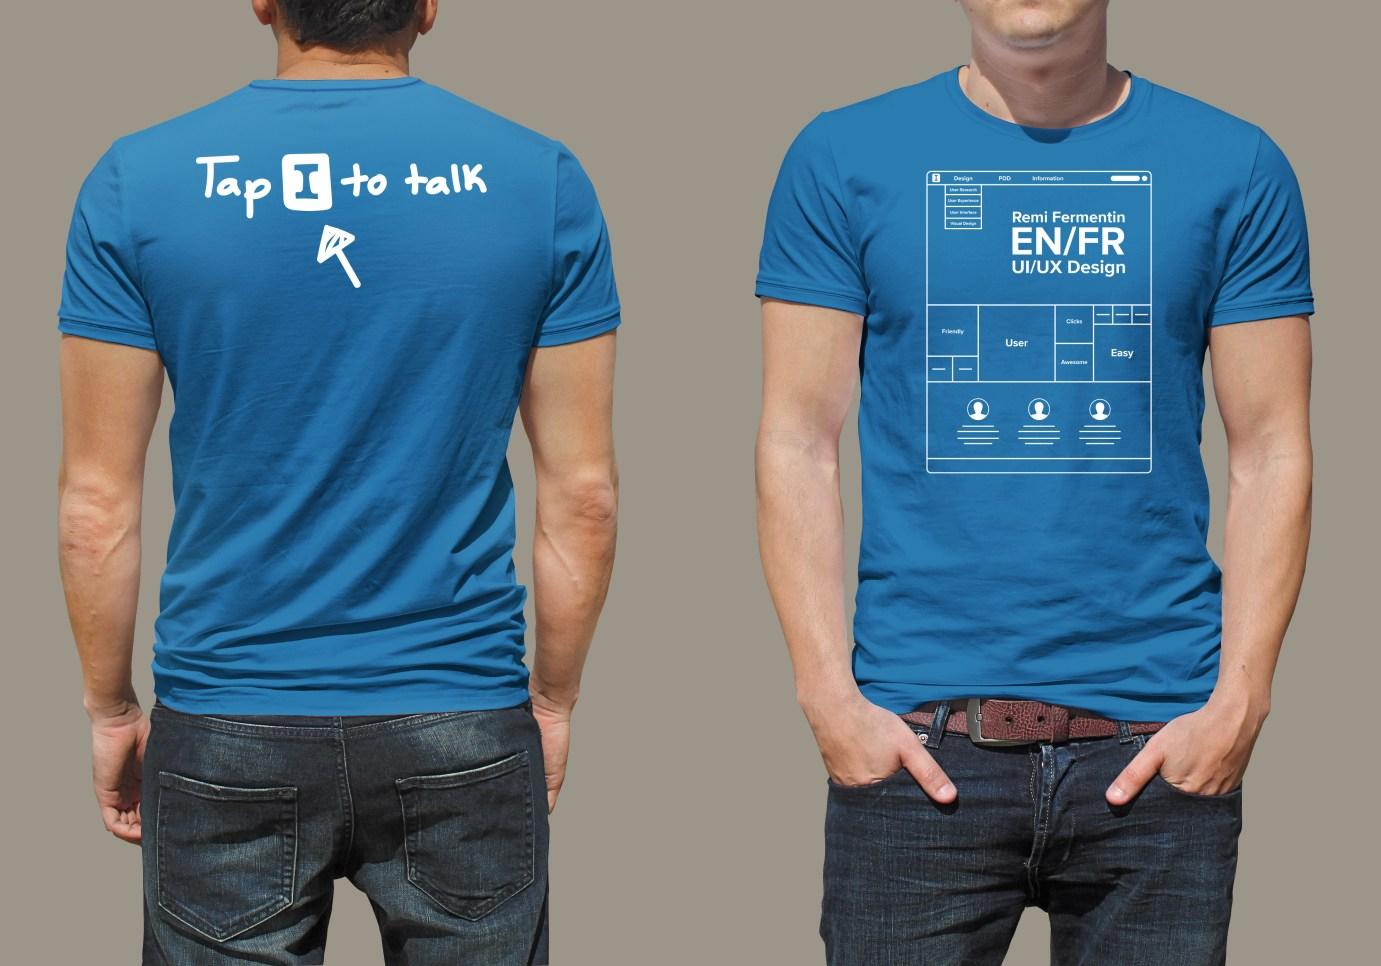 T-shirt design for symposium